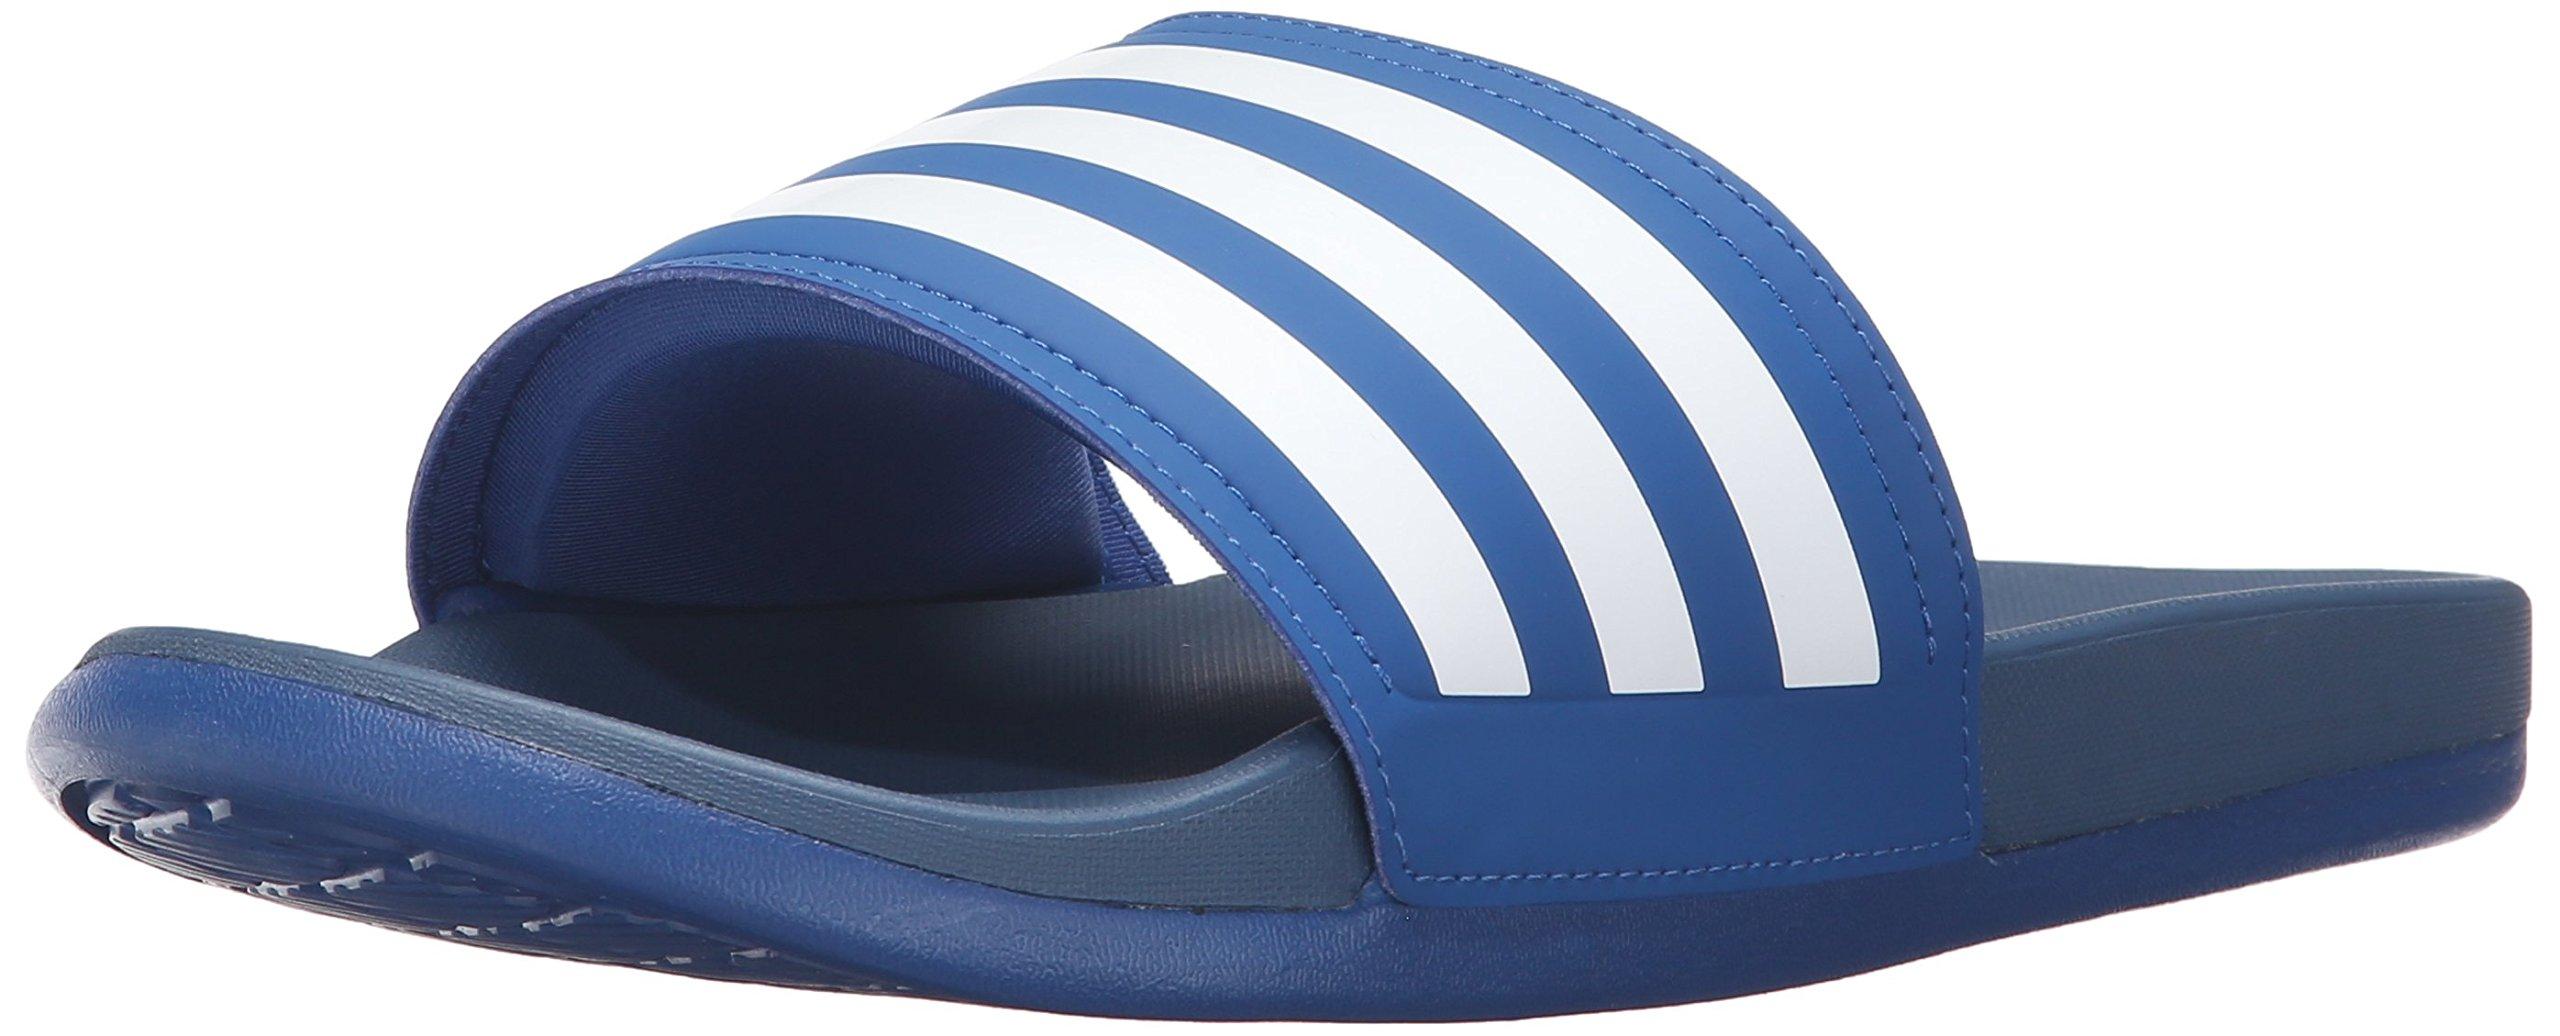 2bfac22fee82 Galleon - Adidas Performance Men s Adilette CF+ C Athletic Sandal ...